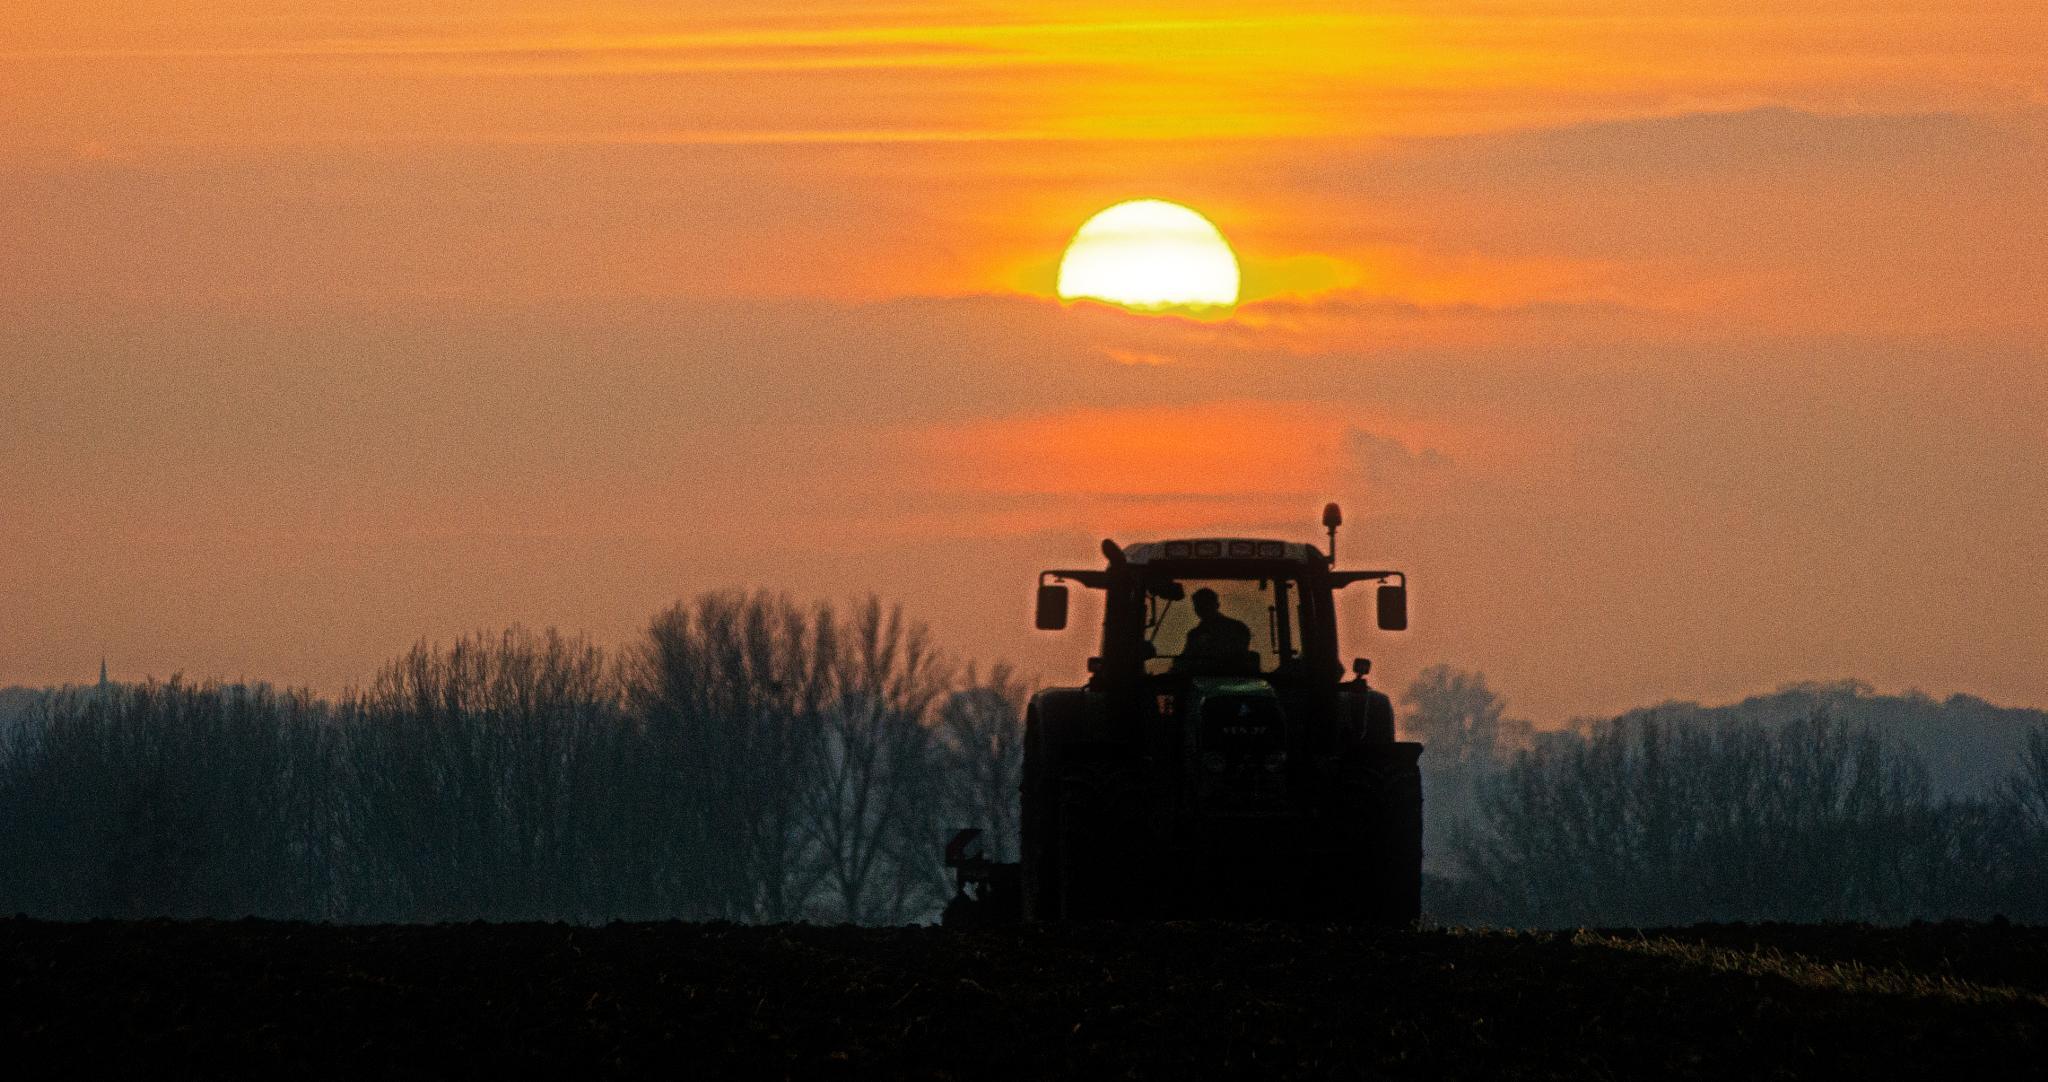 Farming by Mary Kouwenhoven